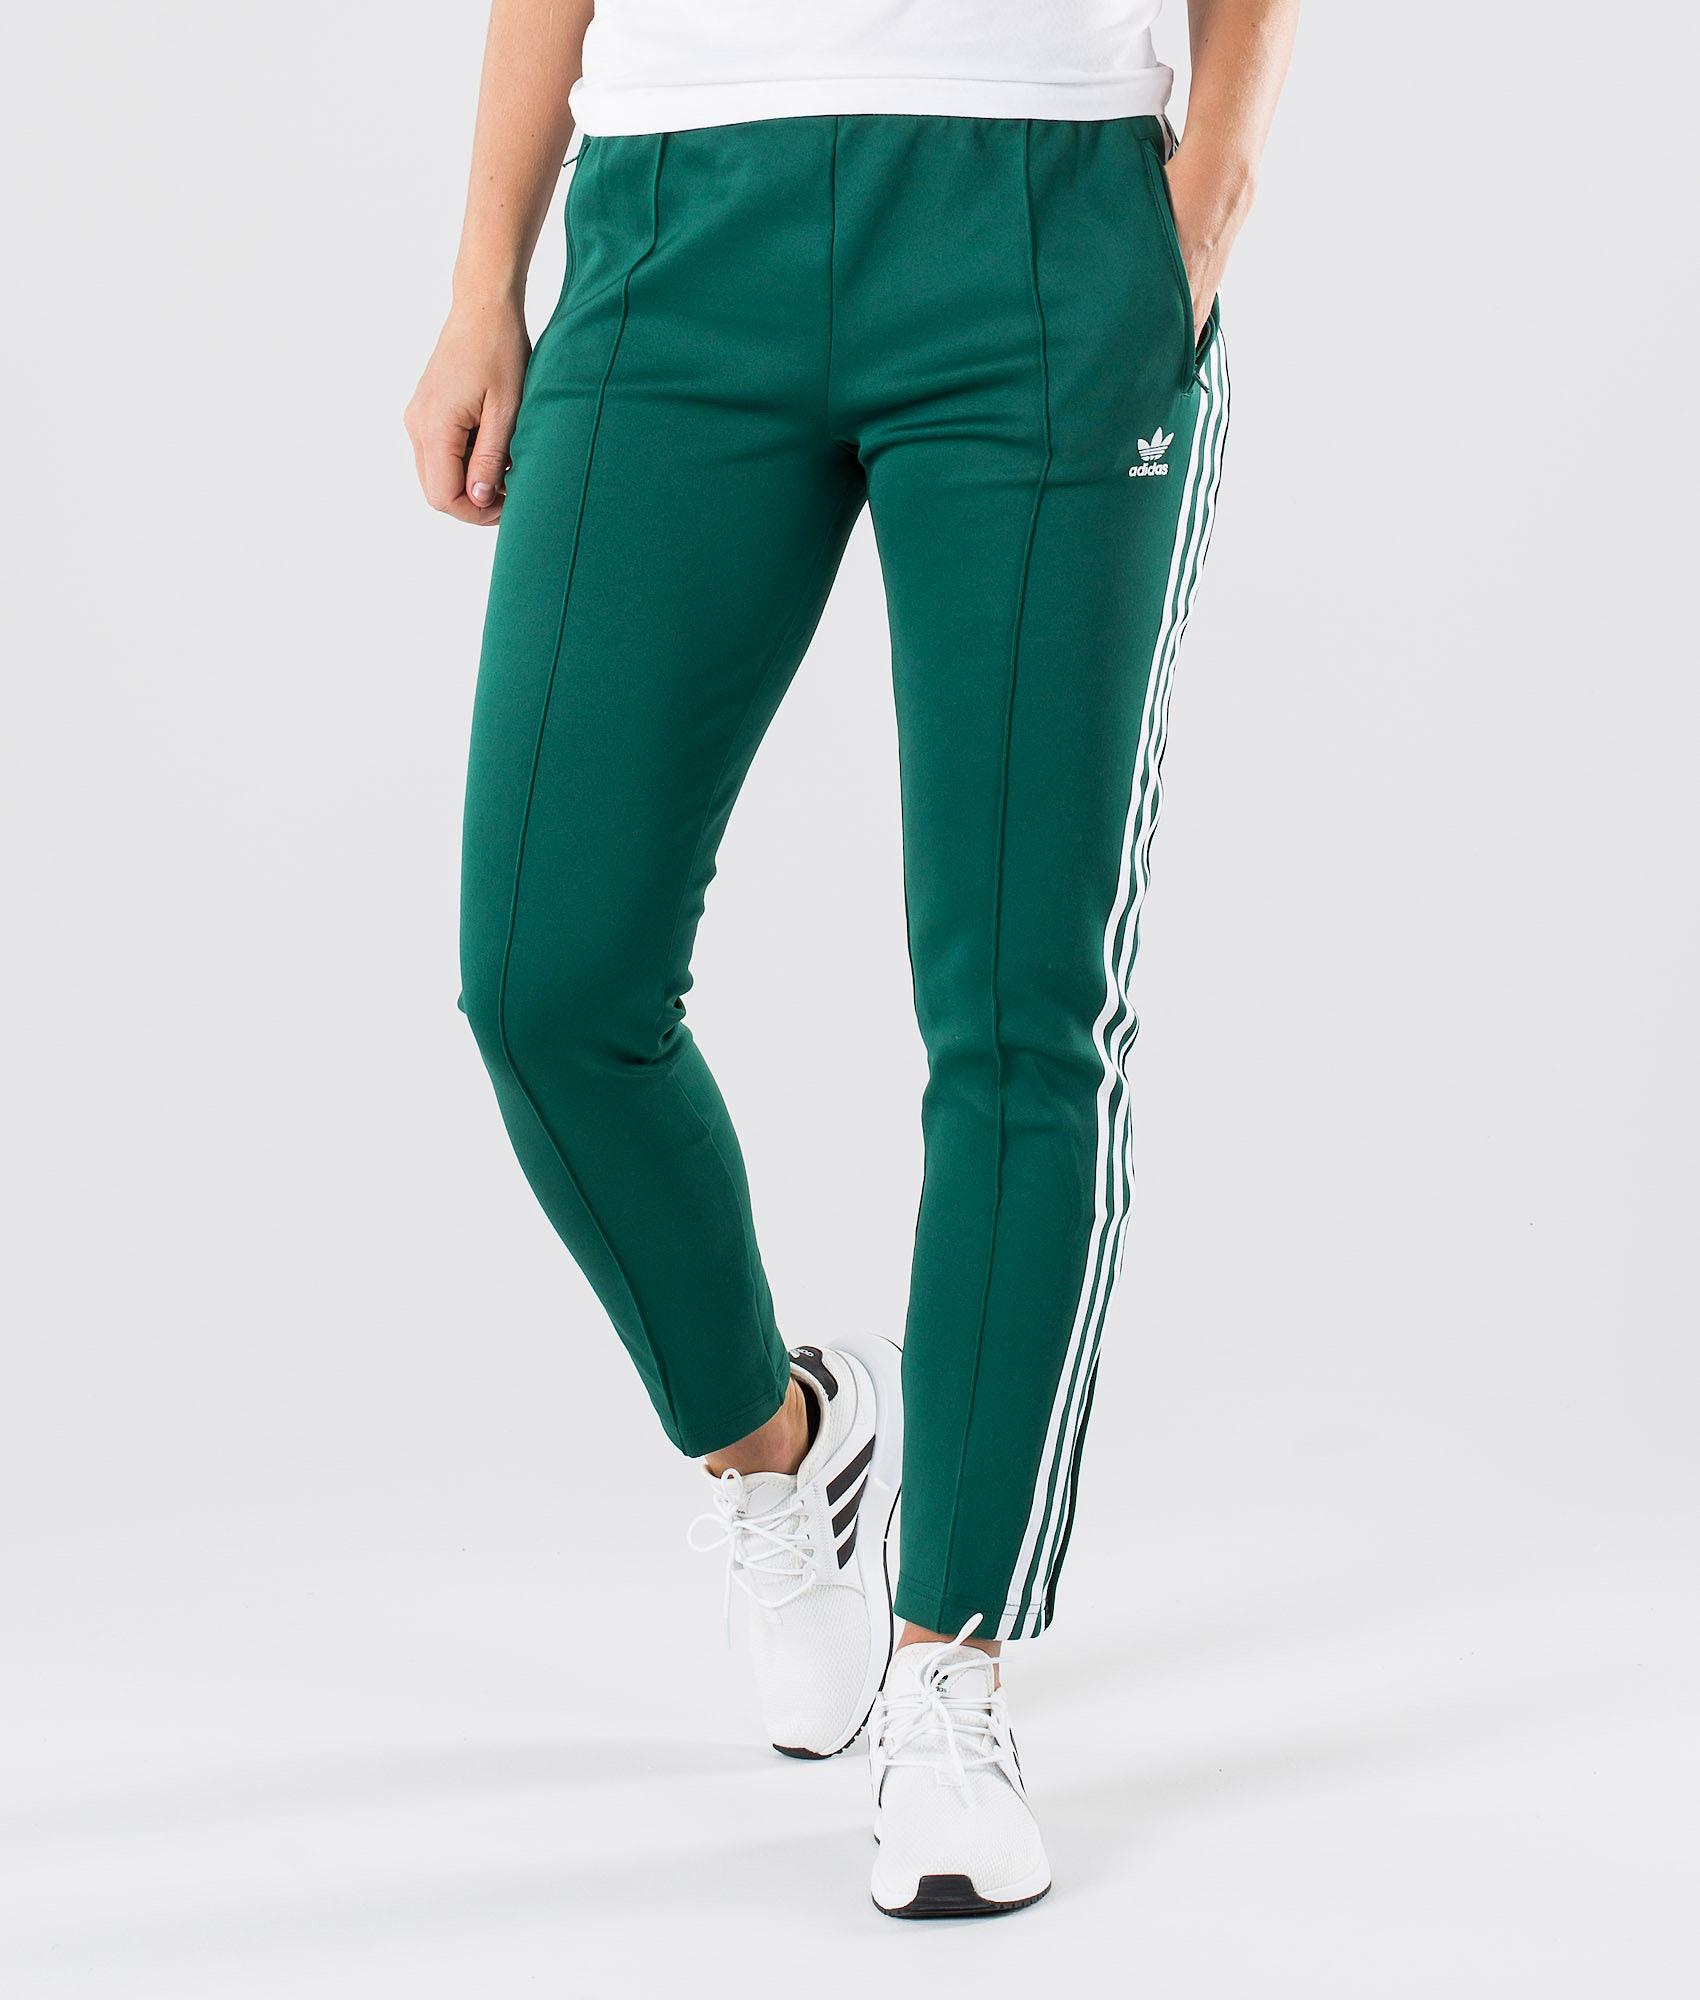 6d4e1291a0f92c Adidas Originals Sst Tp Hosen Collegiate Green - Ridestore.de